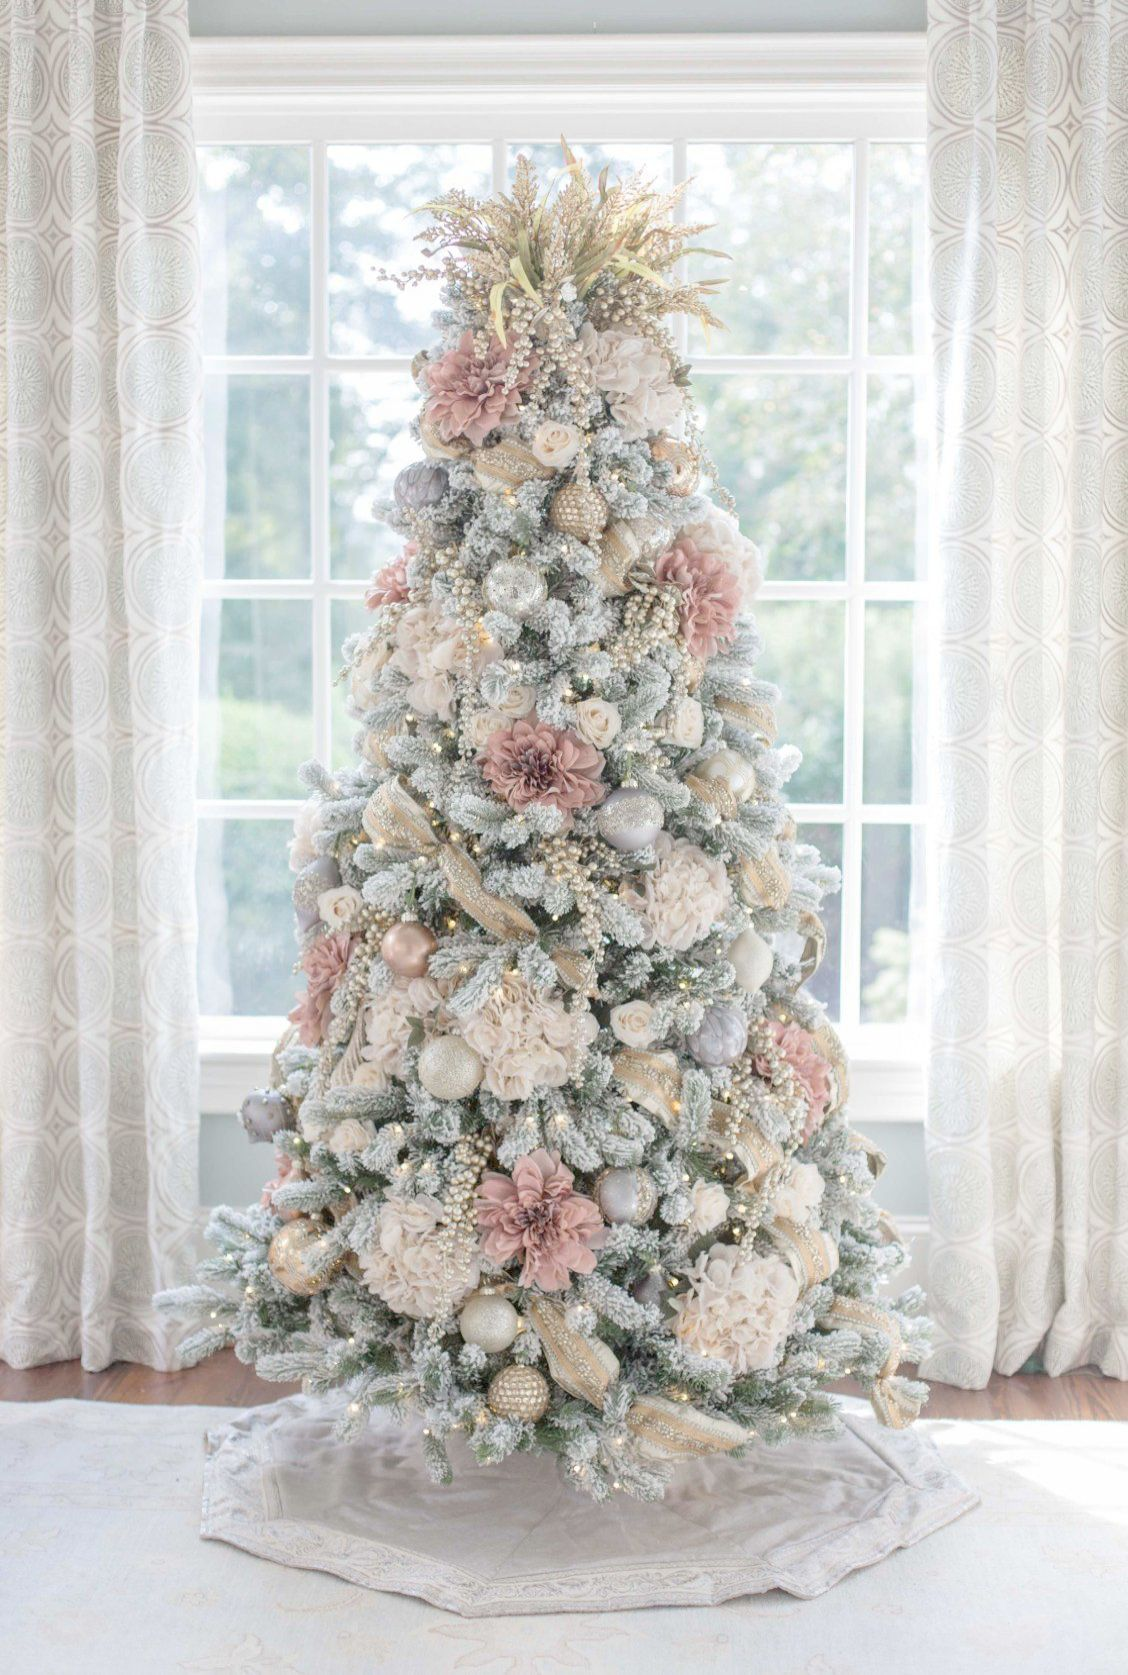 Christmas Tree Shop Storage Time Christmas Trees Kinds During Christmas Trees For Elegant Christmas Trees Pink Christmas Tree Decorations Cool Christmas Trees